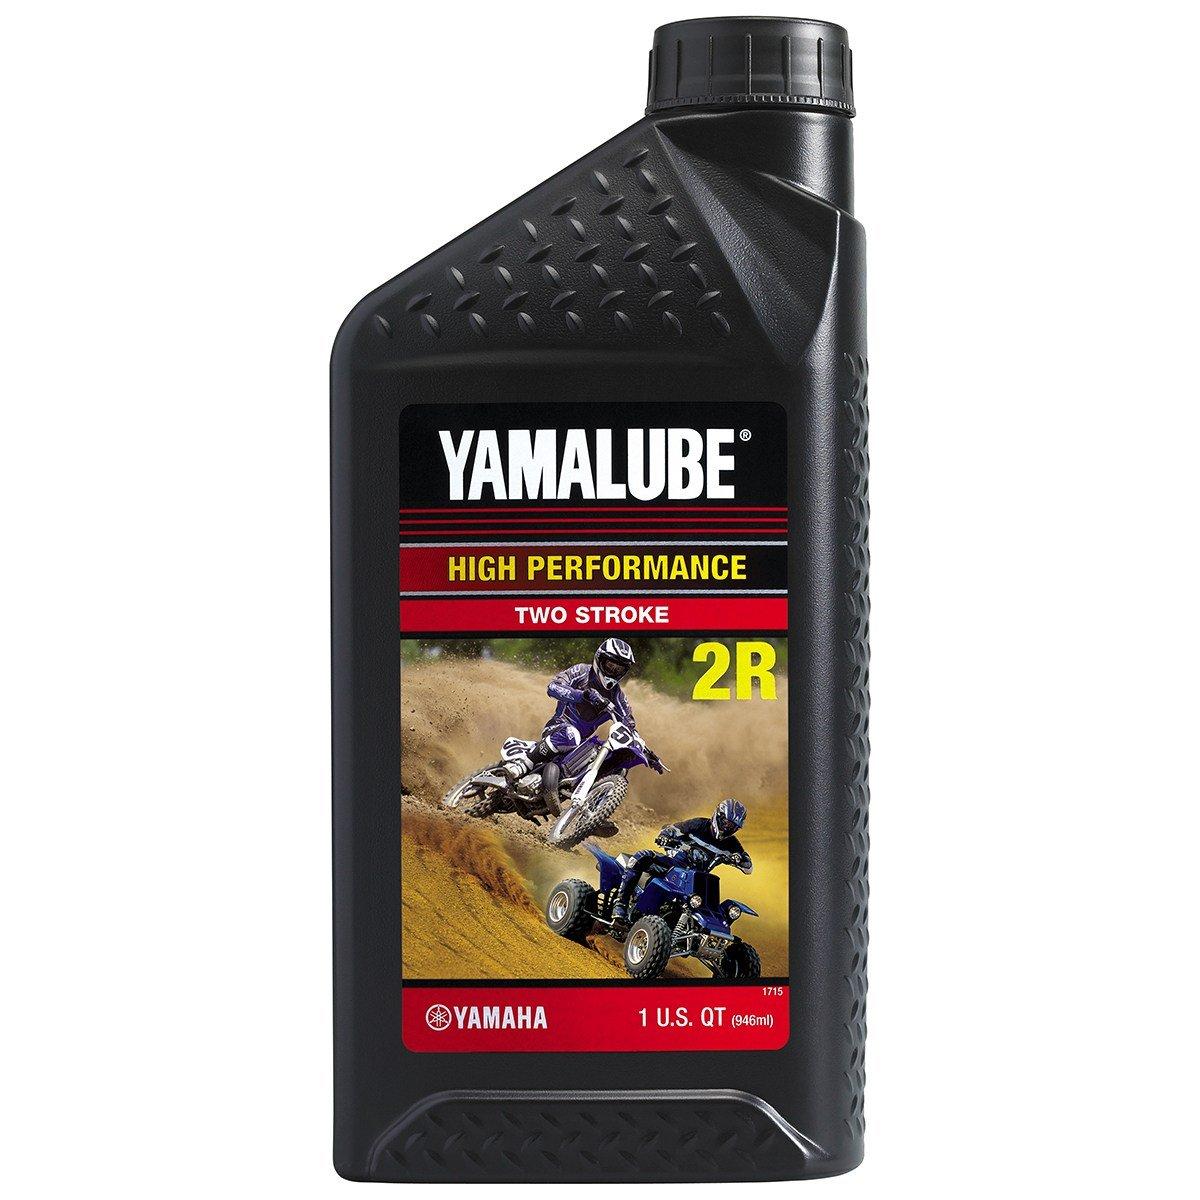 Yamaha LUB-2STRK-R1-12 Yamalube 2R RACE 2-STROKE OIL - 1 one-quart bottle LUB2STRKR112 Made by Yamaha